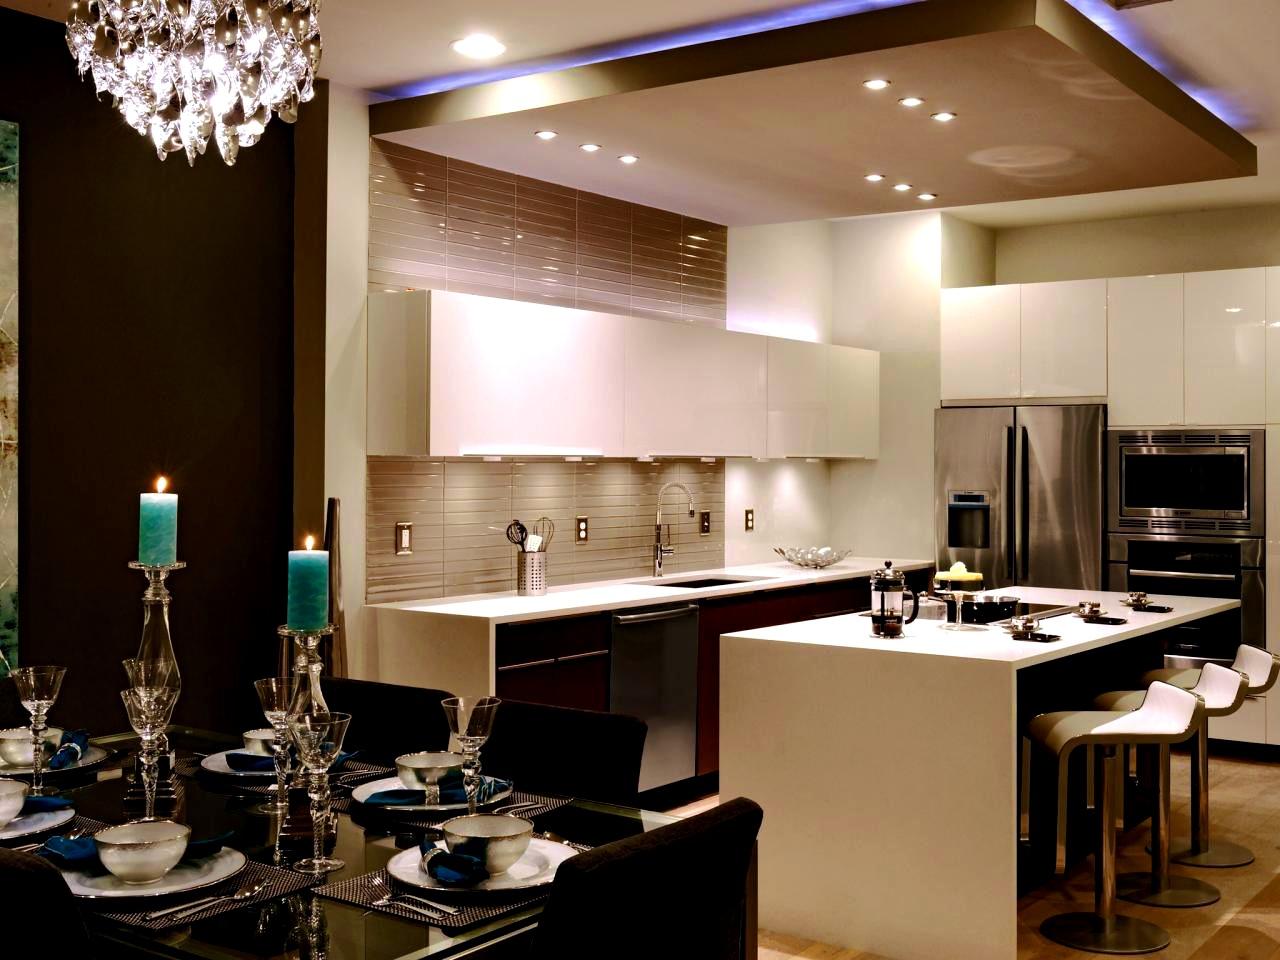 modern kitchen ceiling design ideas – ksa g.com